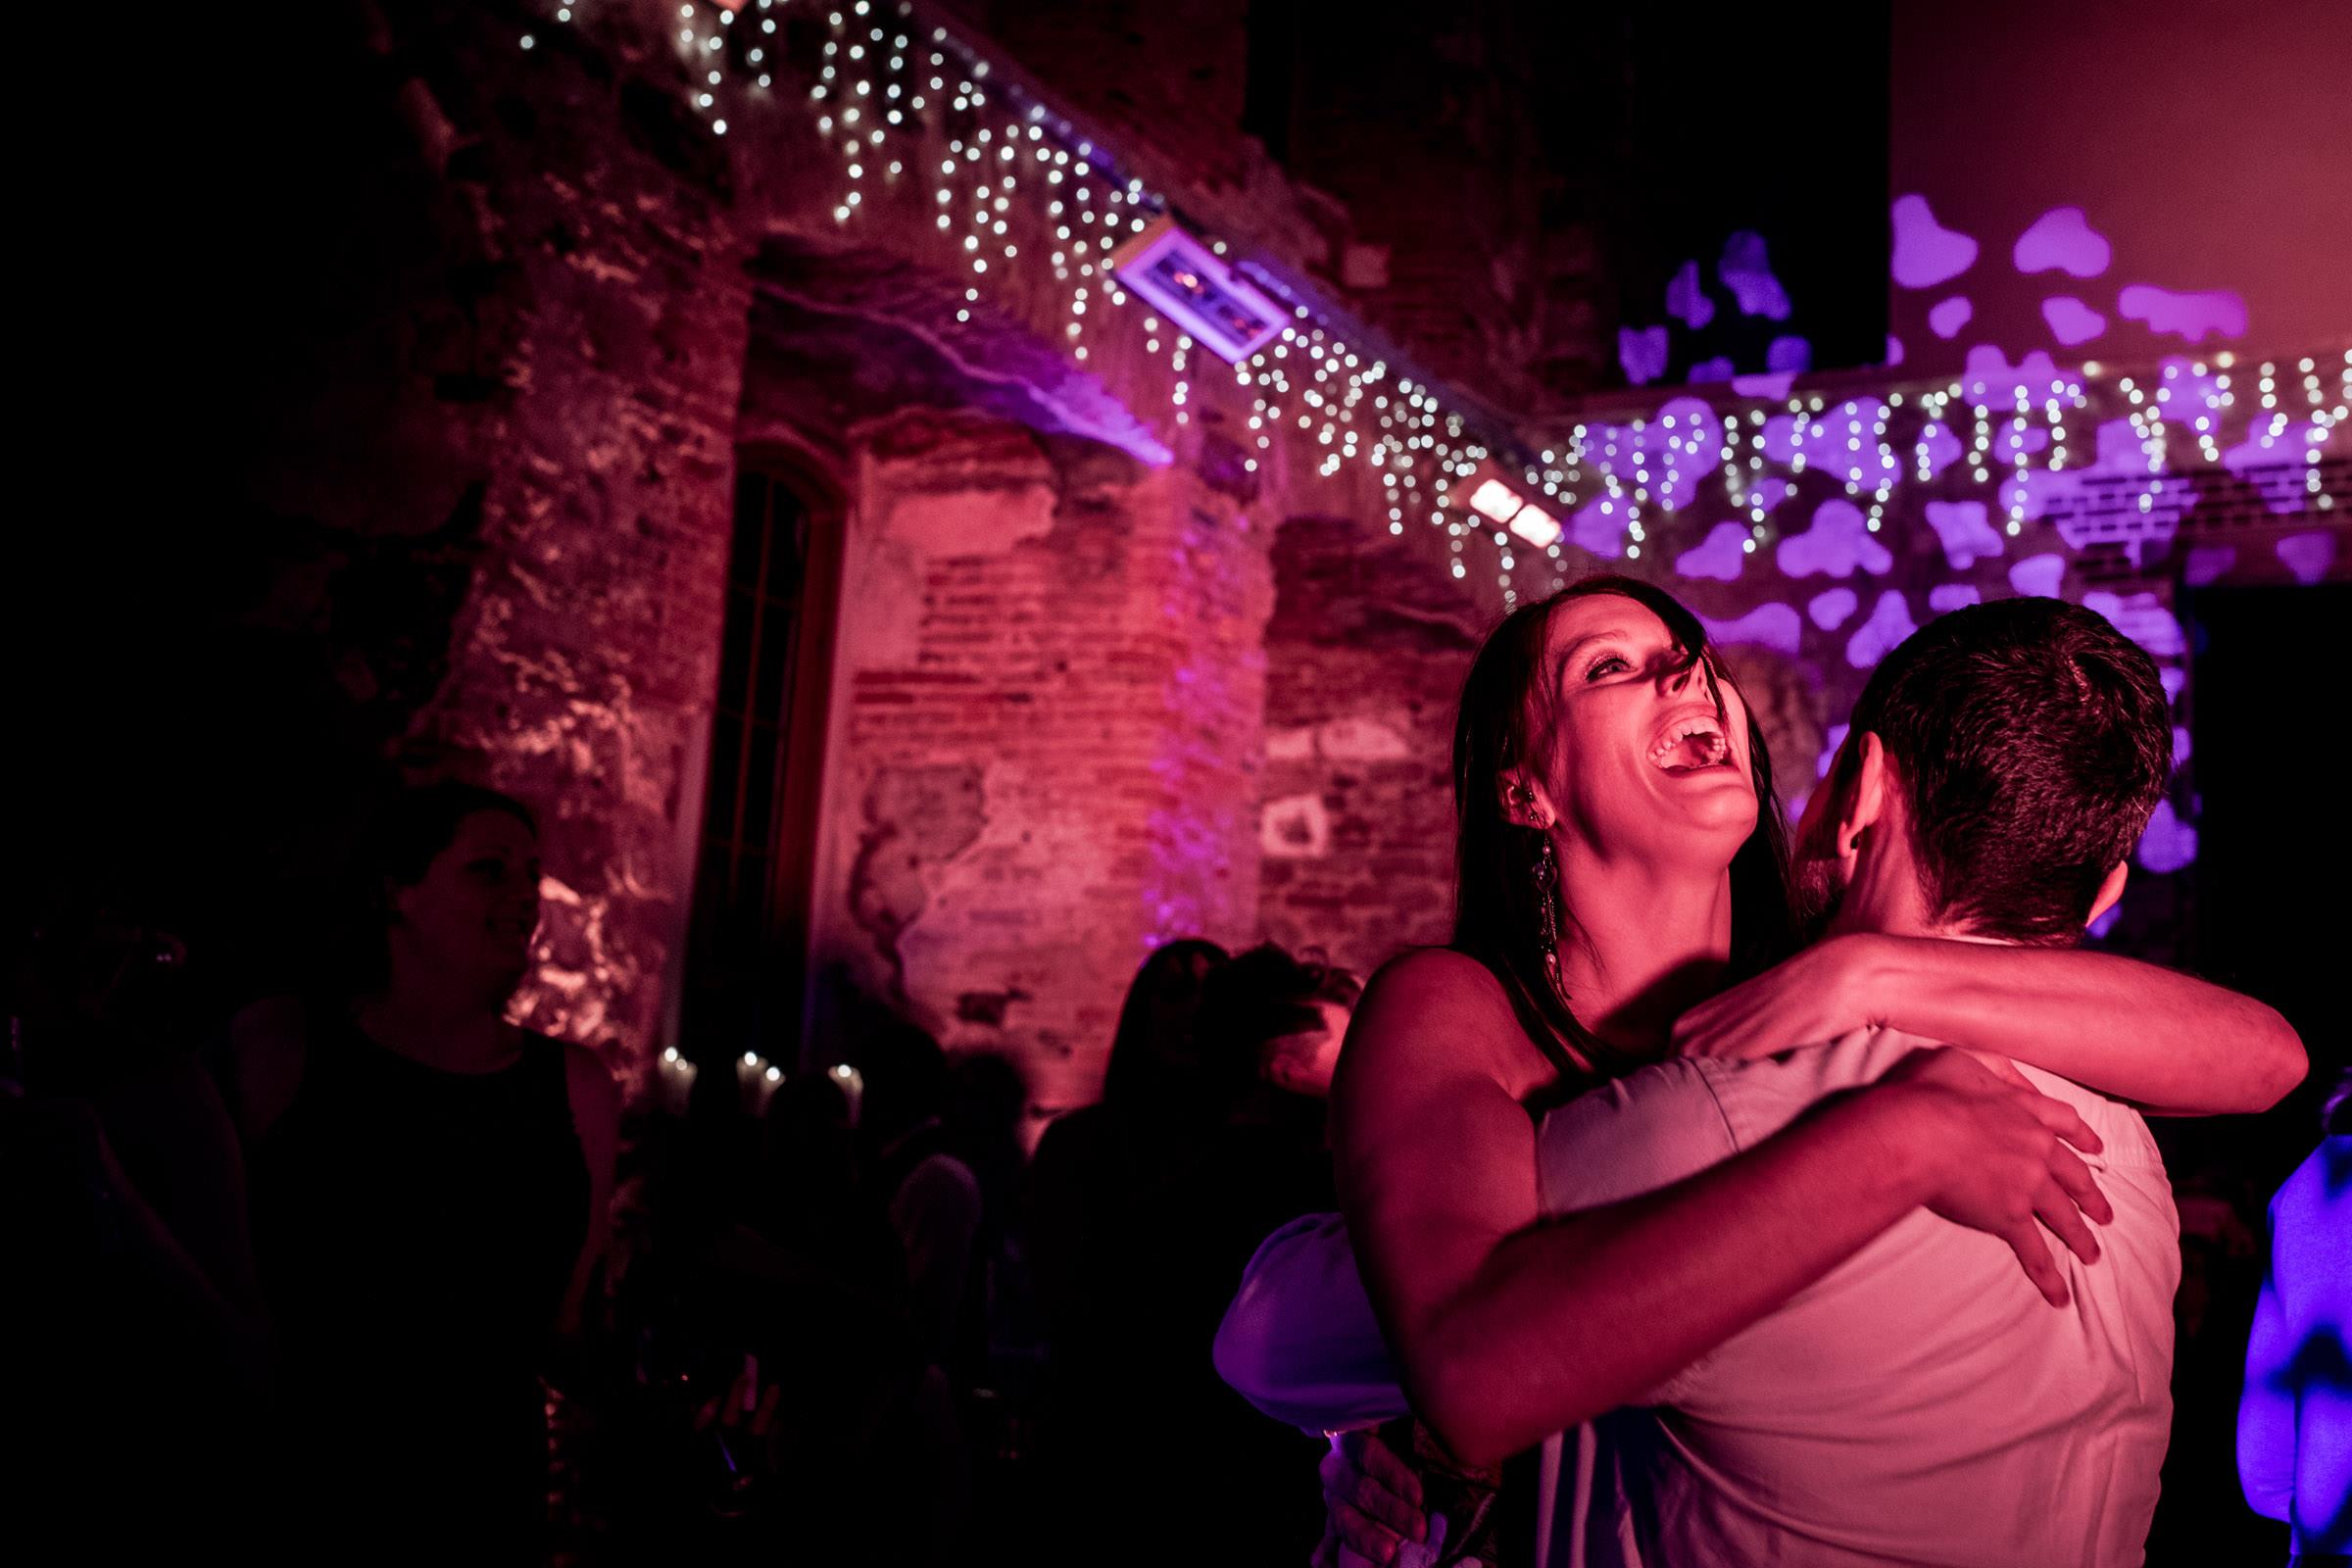 Lulworth Castle Wedding Photography 035.jpg